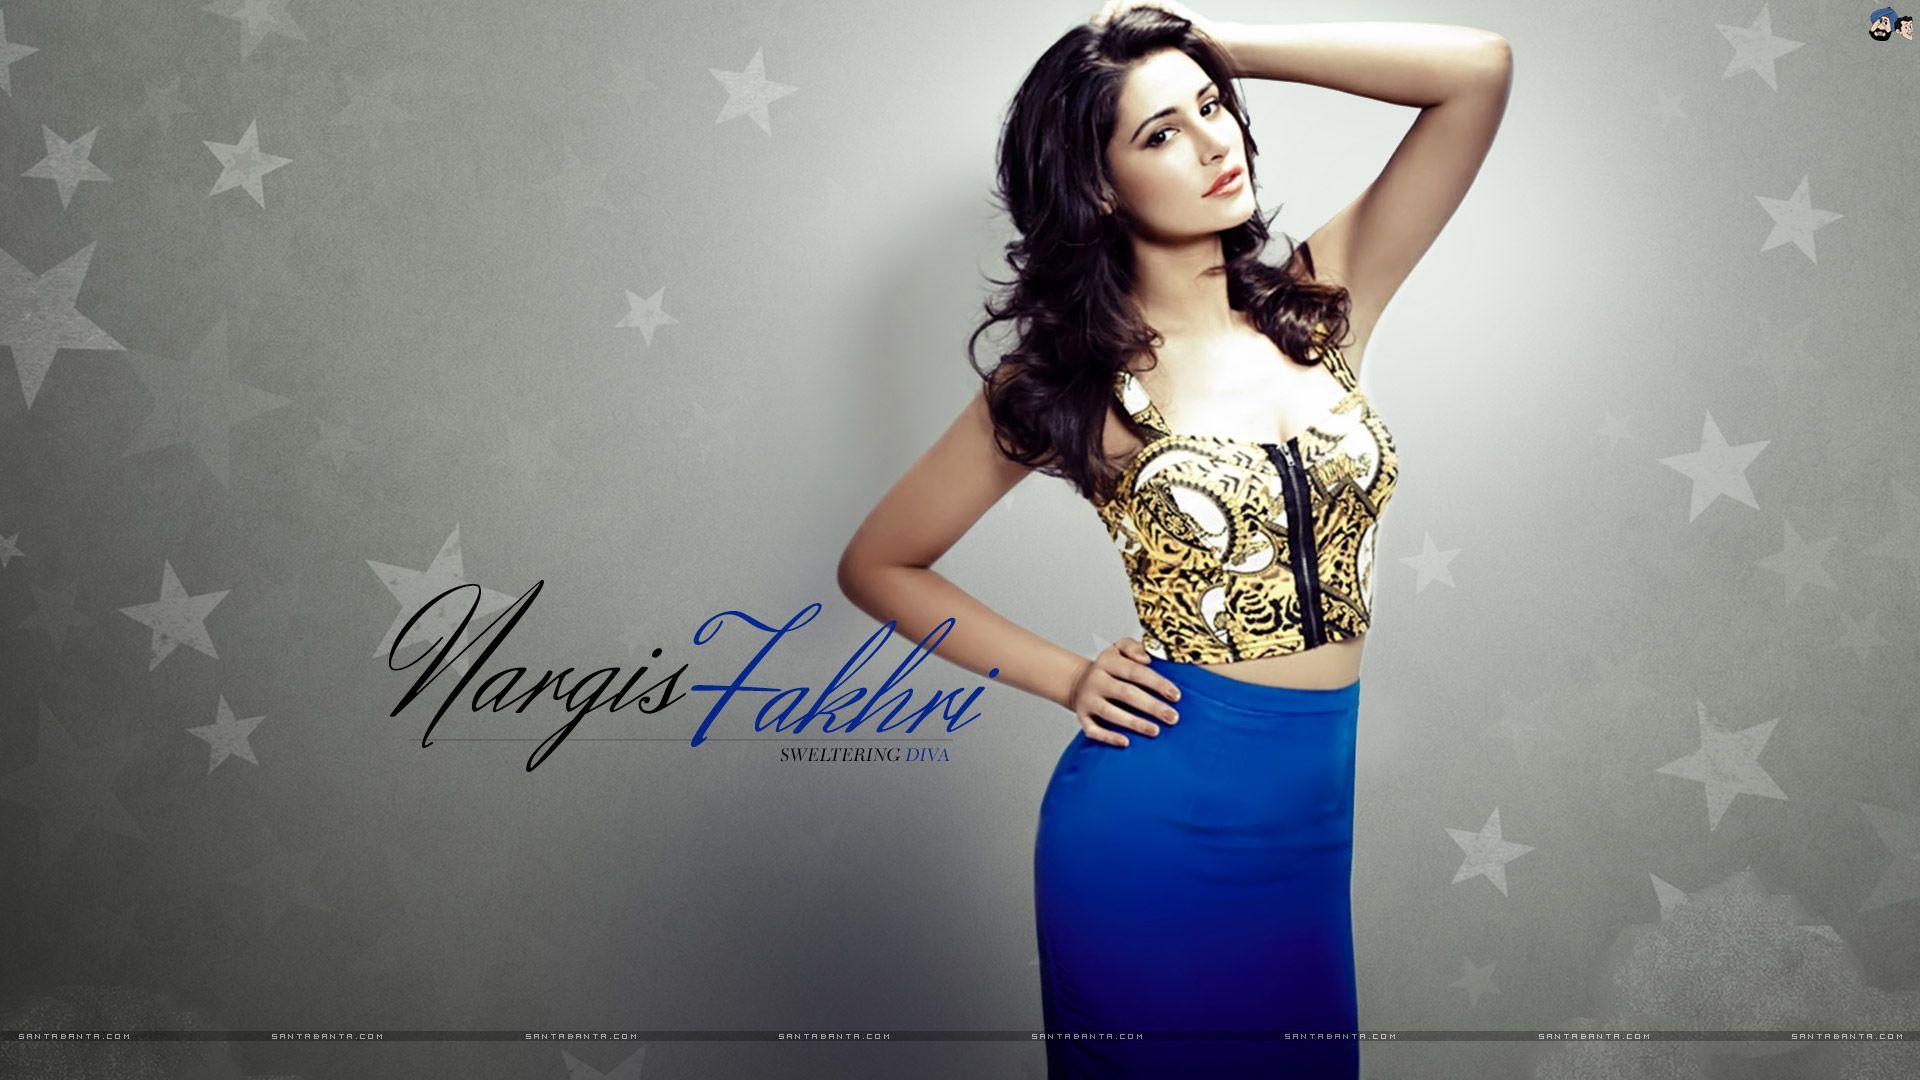 nargis-fakhri-45a.jpg